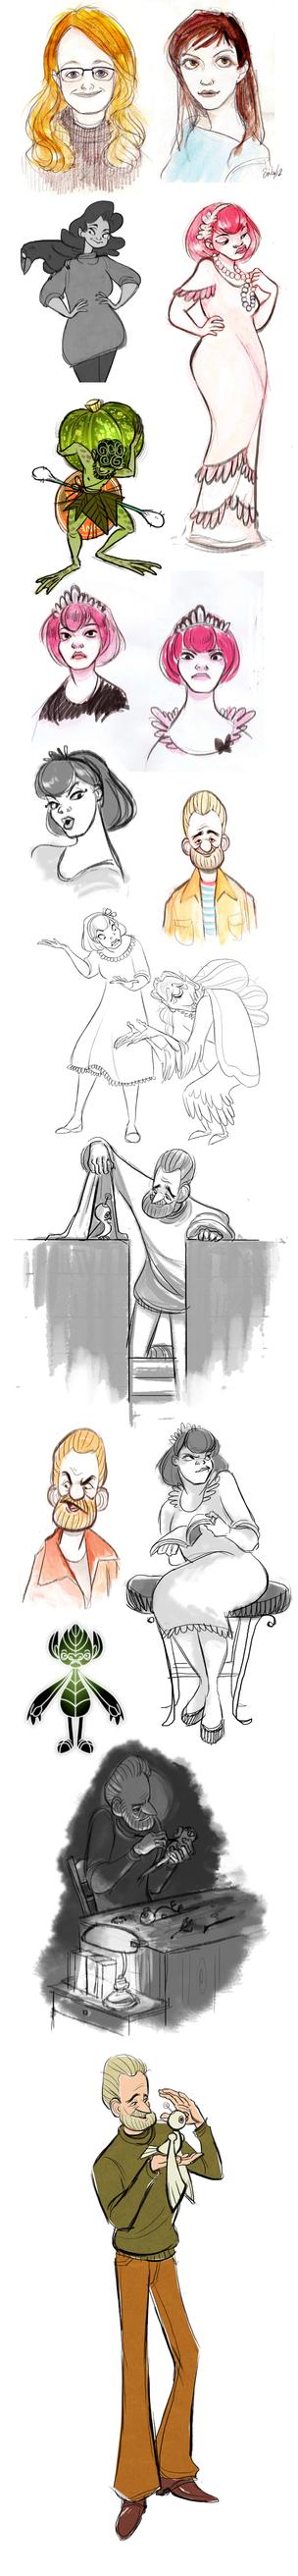 Doodles IV by sparrowbirdd